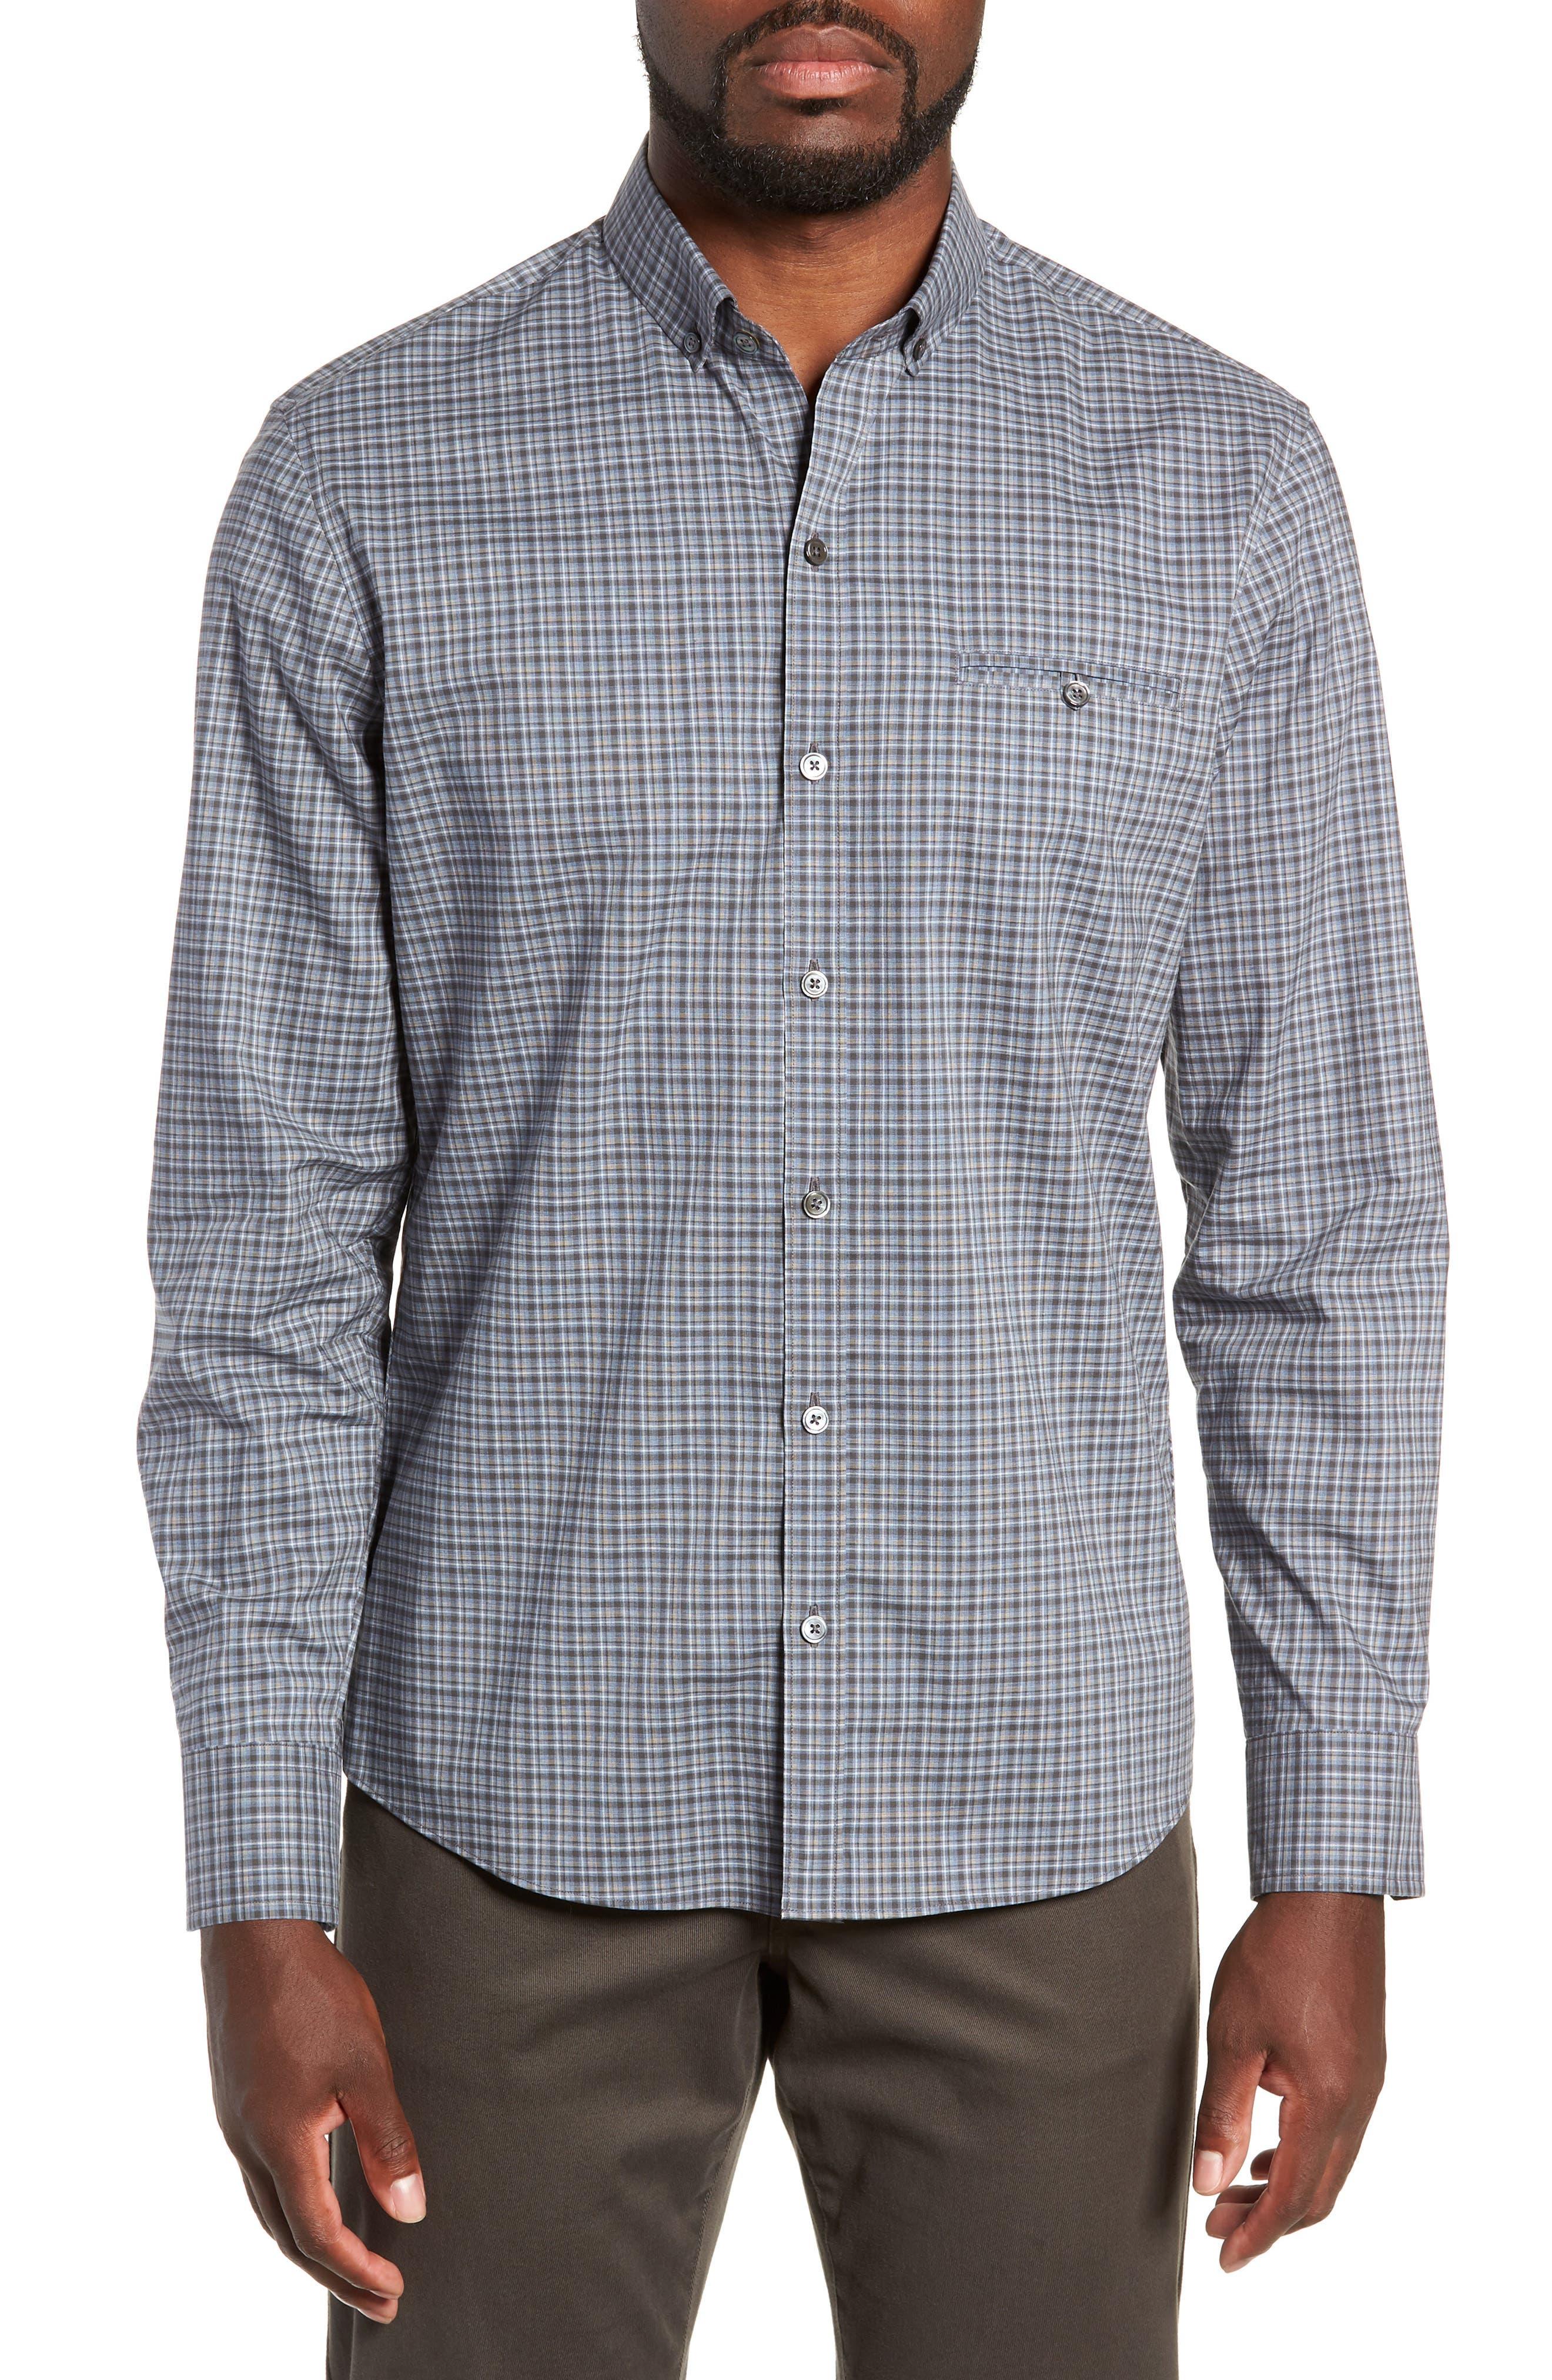 ZACHARY PRELL Chu Regular Fit Plaid Sport Shirt, Main, color, 021